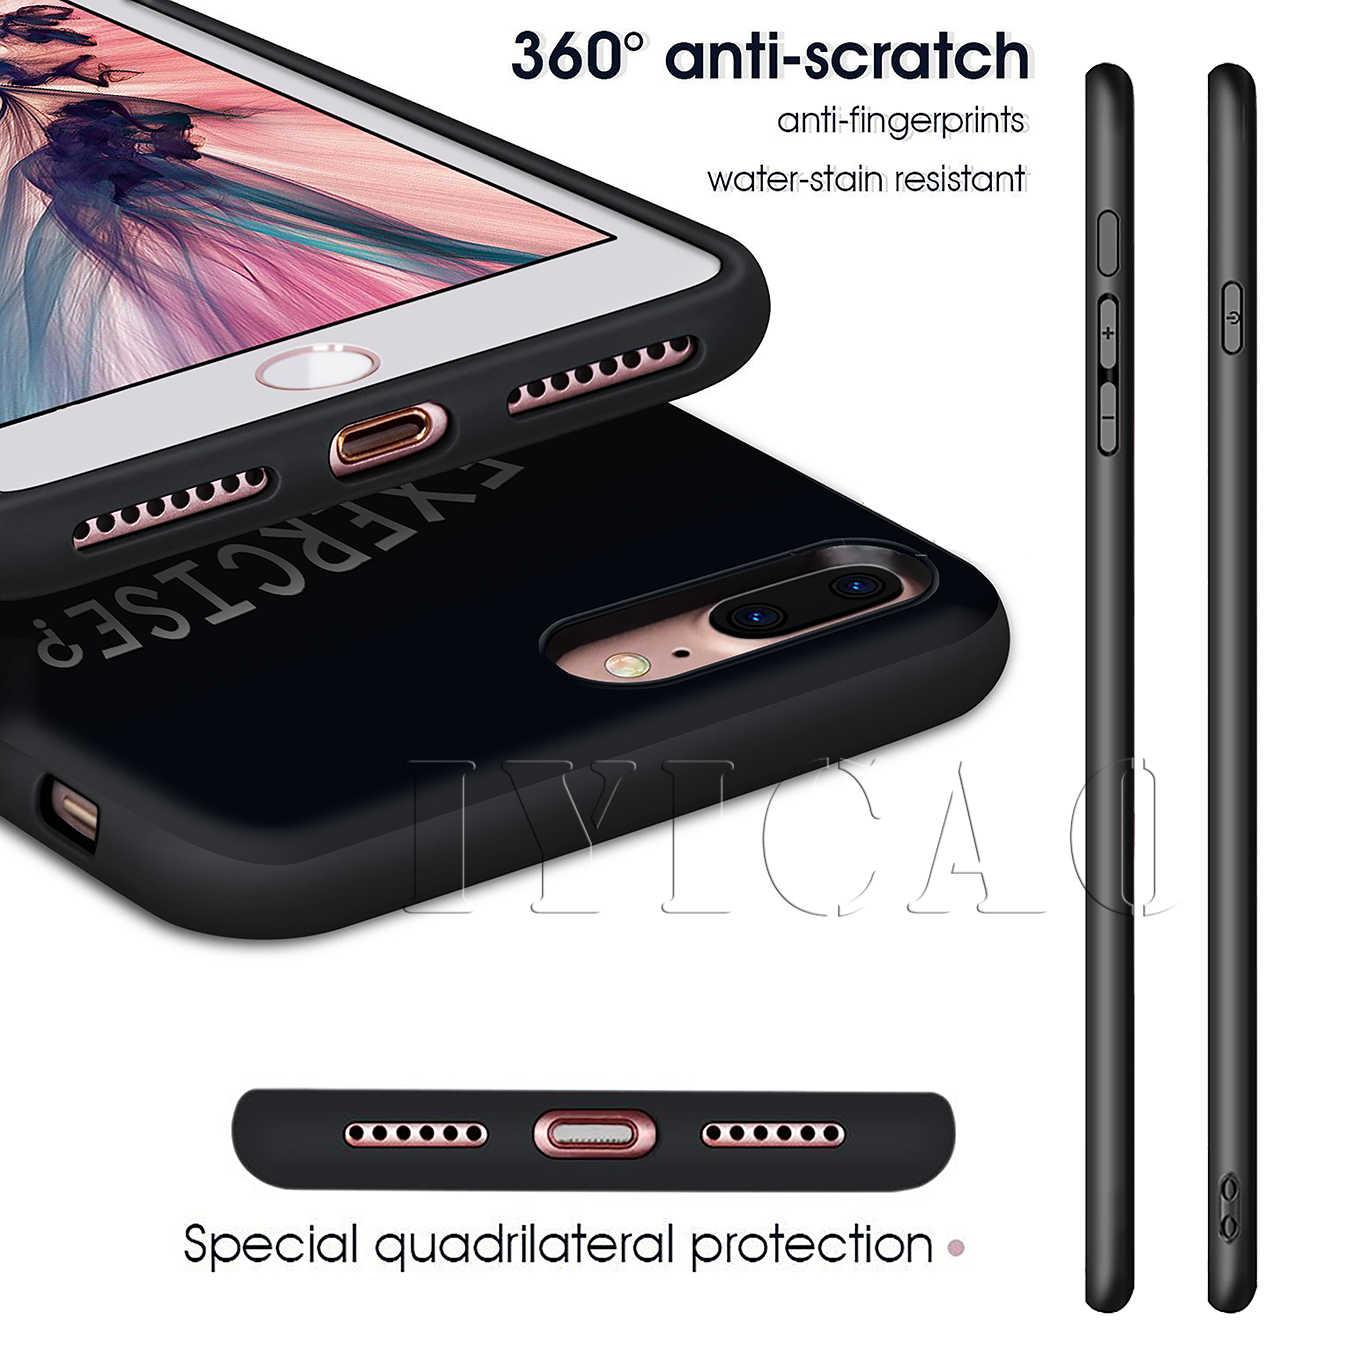 Iyicao h.e.r tpu macio silicone caso de telefone para xiaomi redmi nota 8 8a 8 t 7 7a 6 6a 5 5a ir s2 k30 k20 pro capa